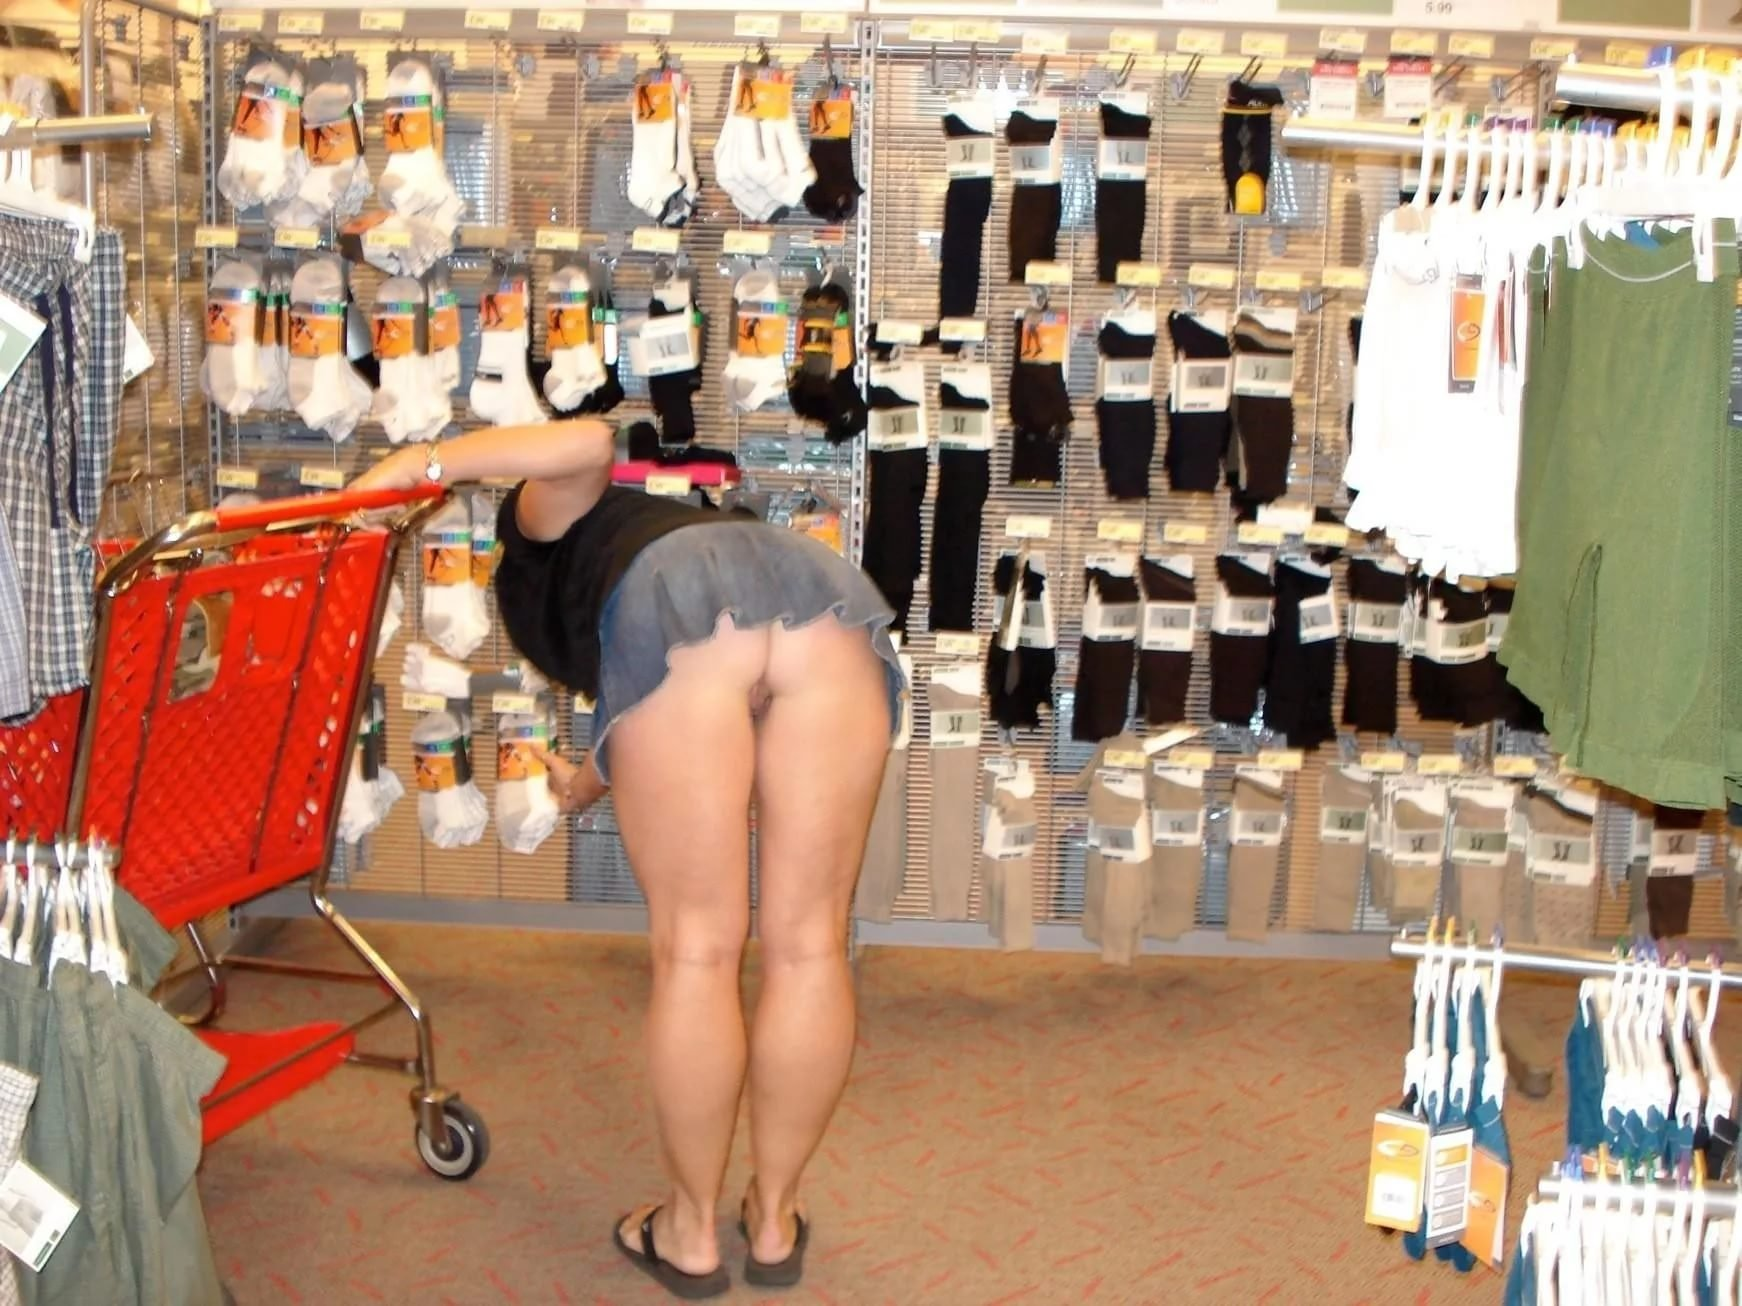 Девчонки ходят по магазинам без трусов видео